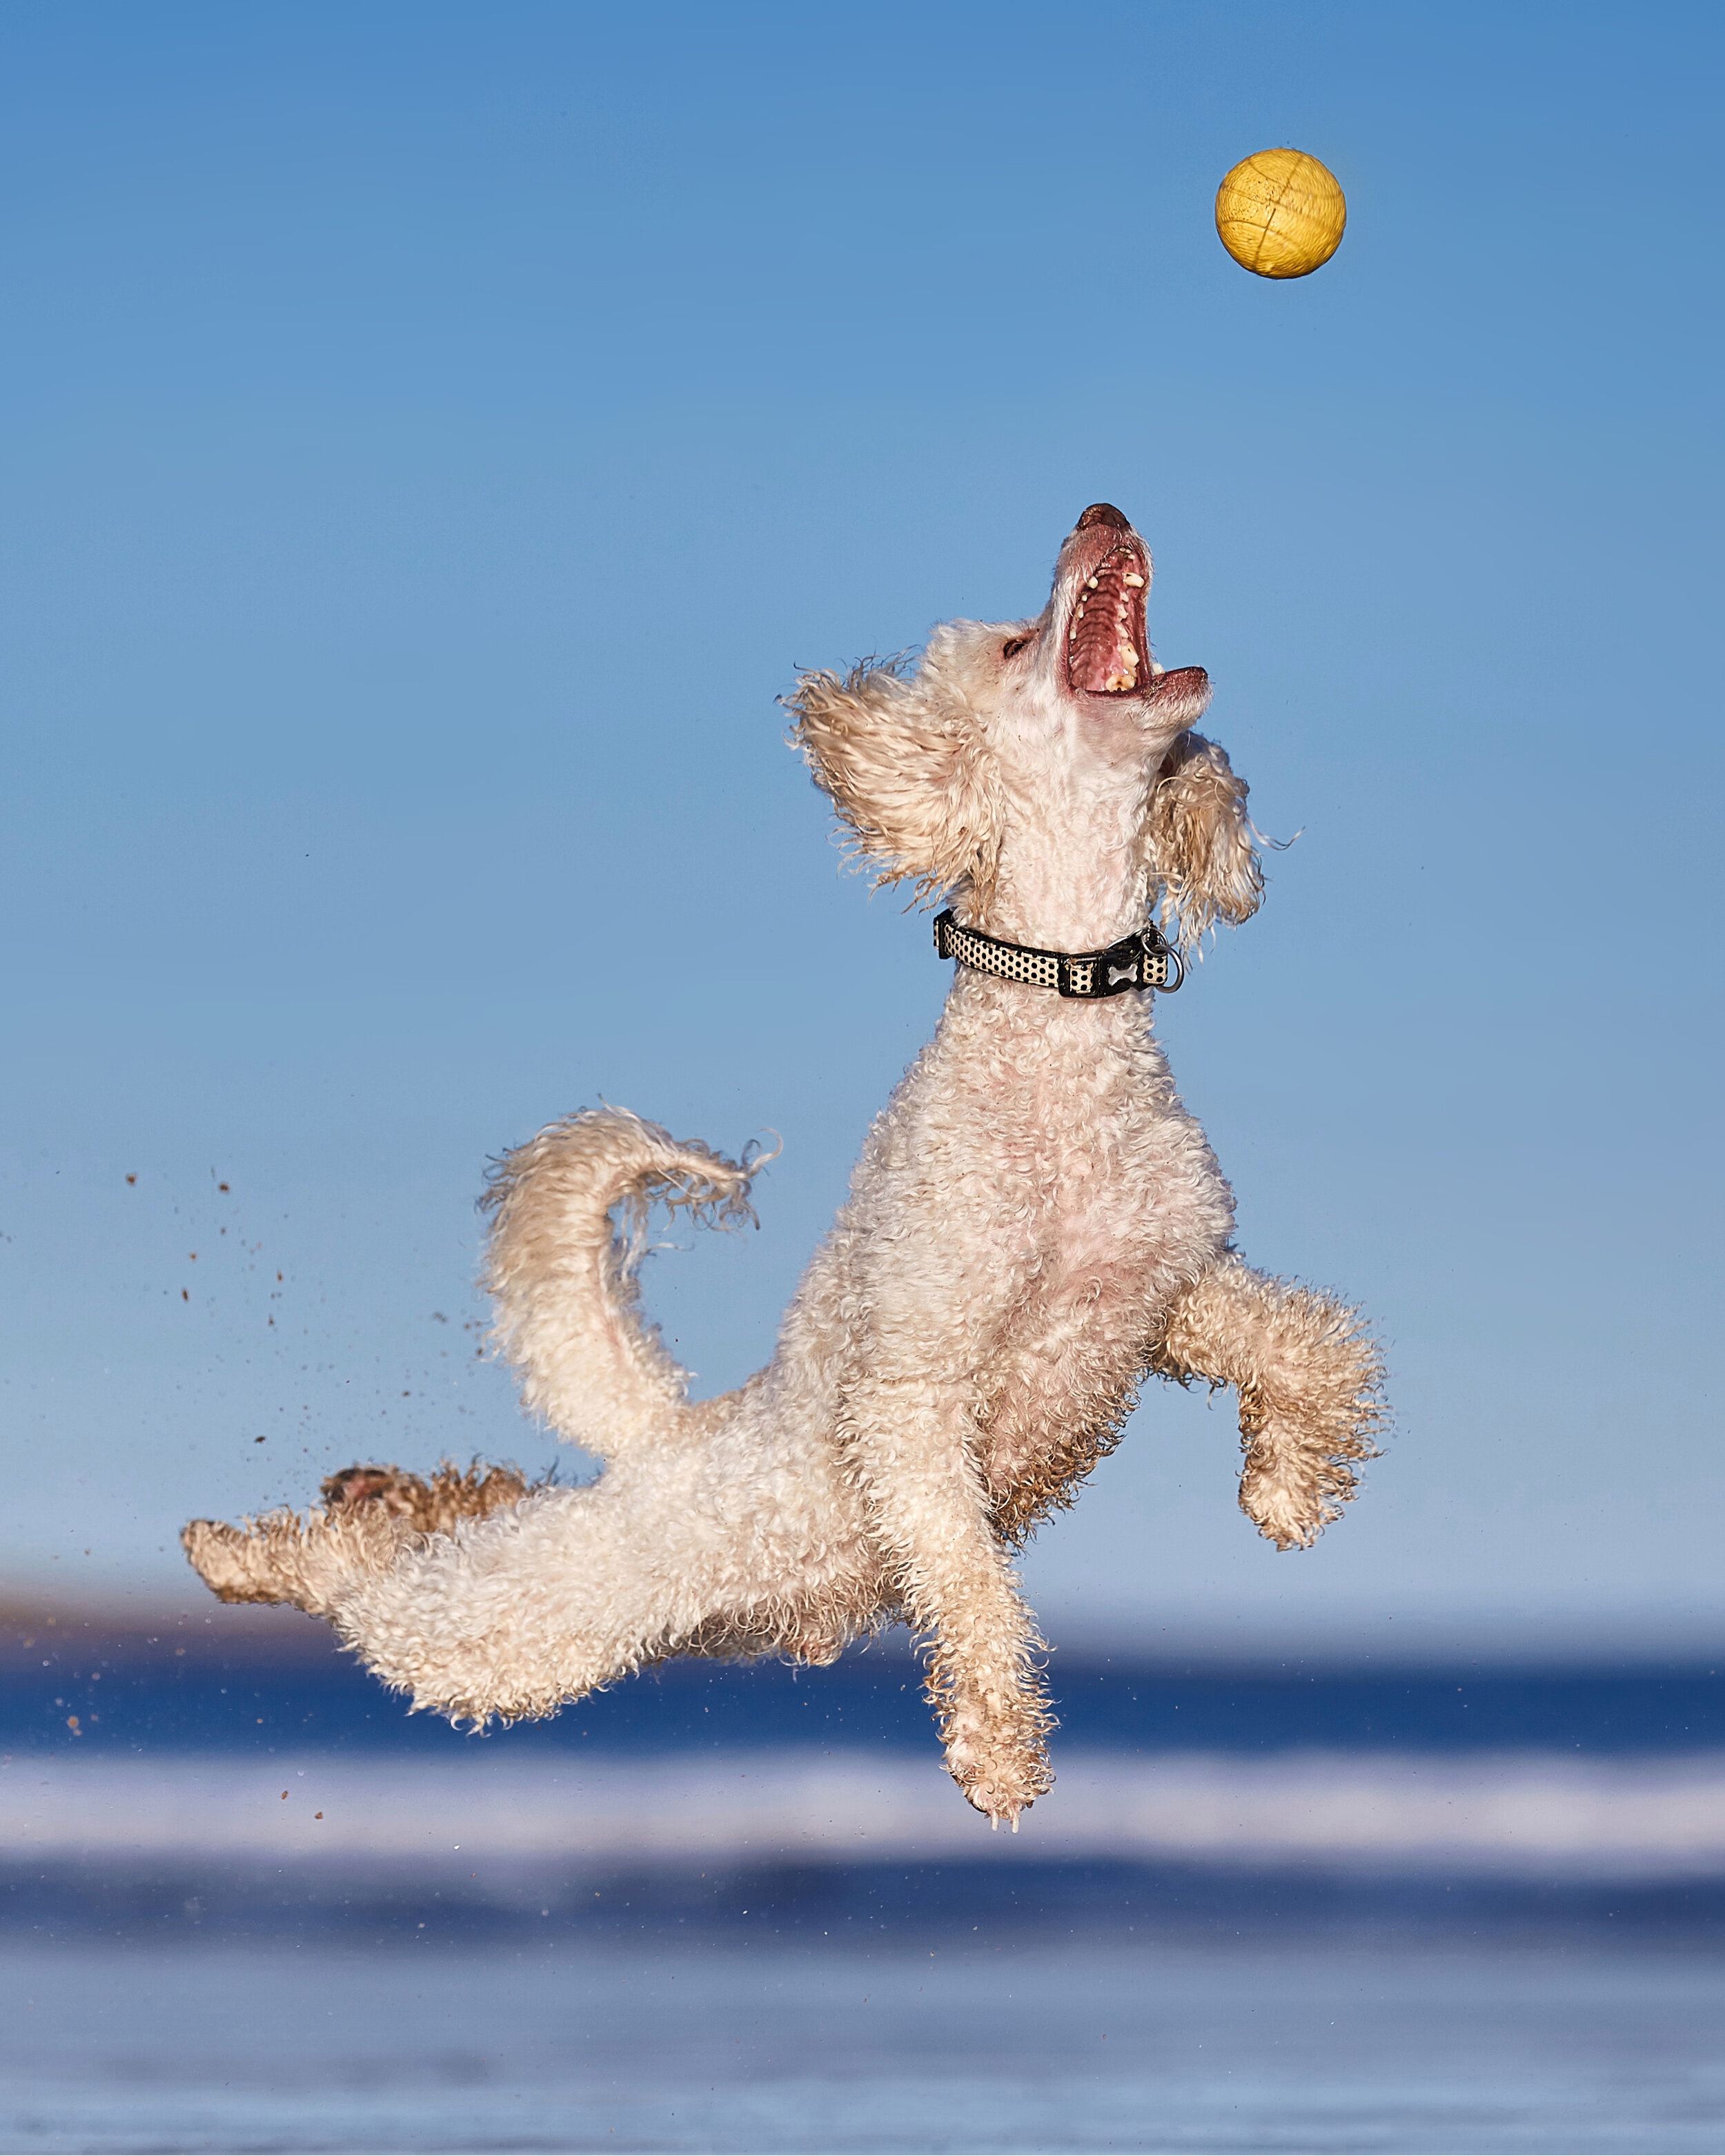 Ball Is Life_DarrenHall.jpg